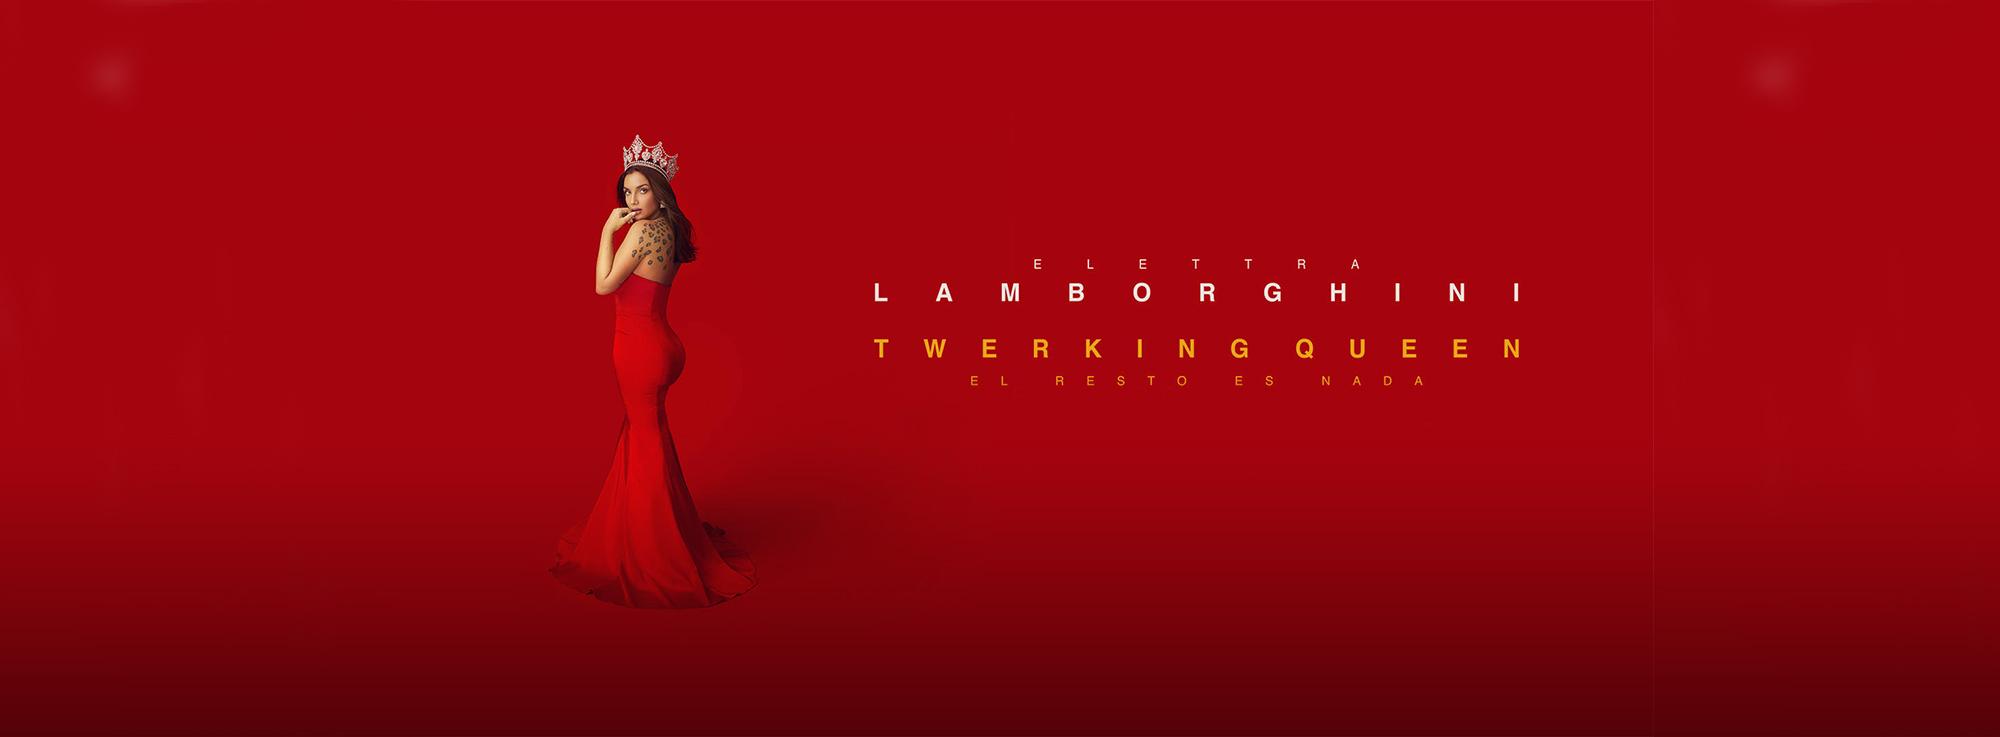 Bari (Santa Caterina): Twerking Queen-El resto es nada instore tour